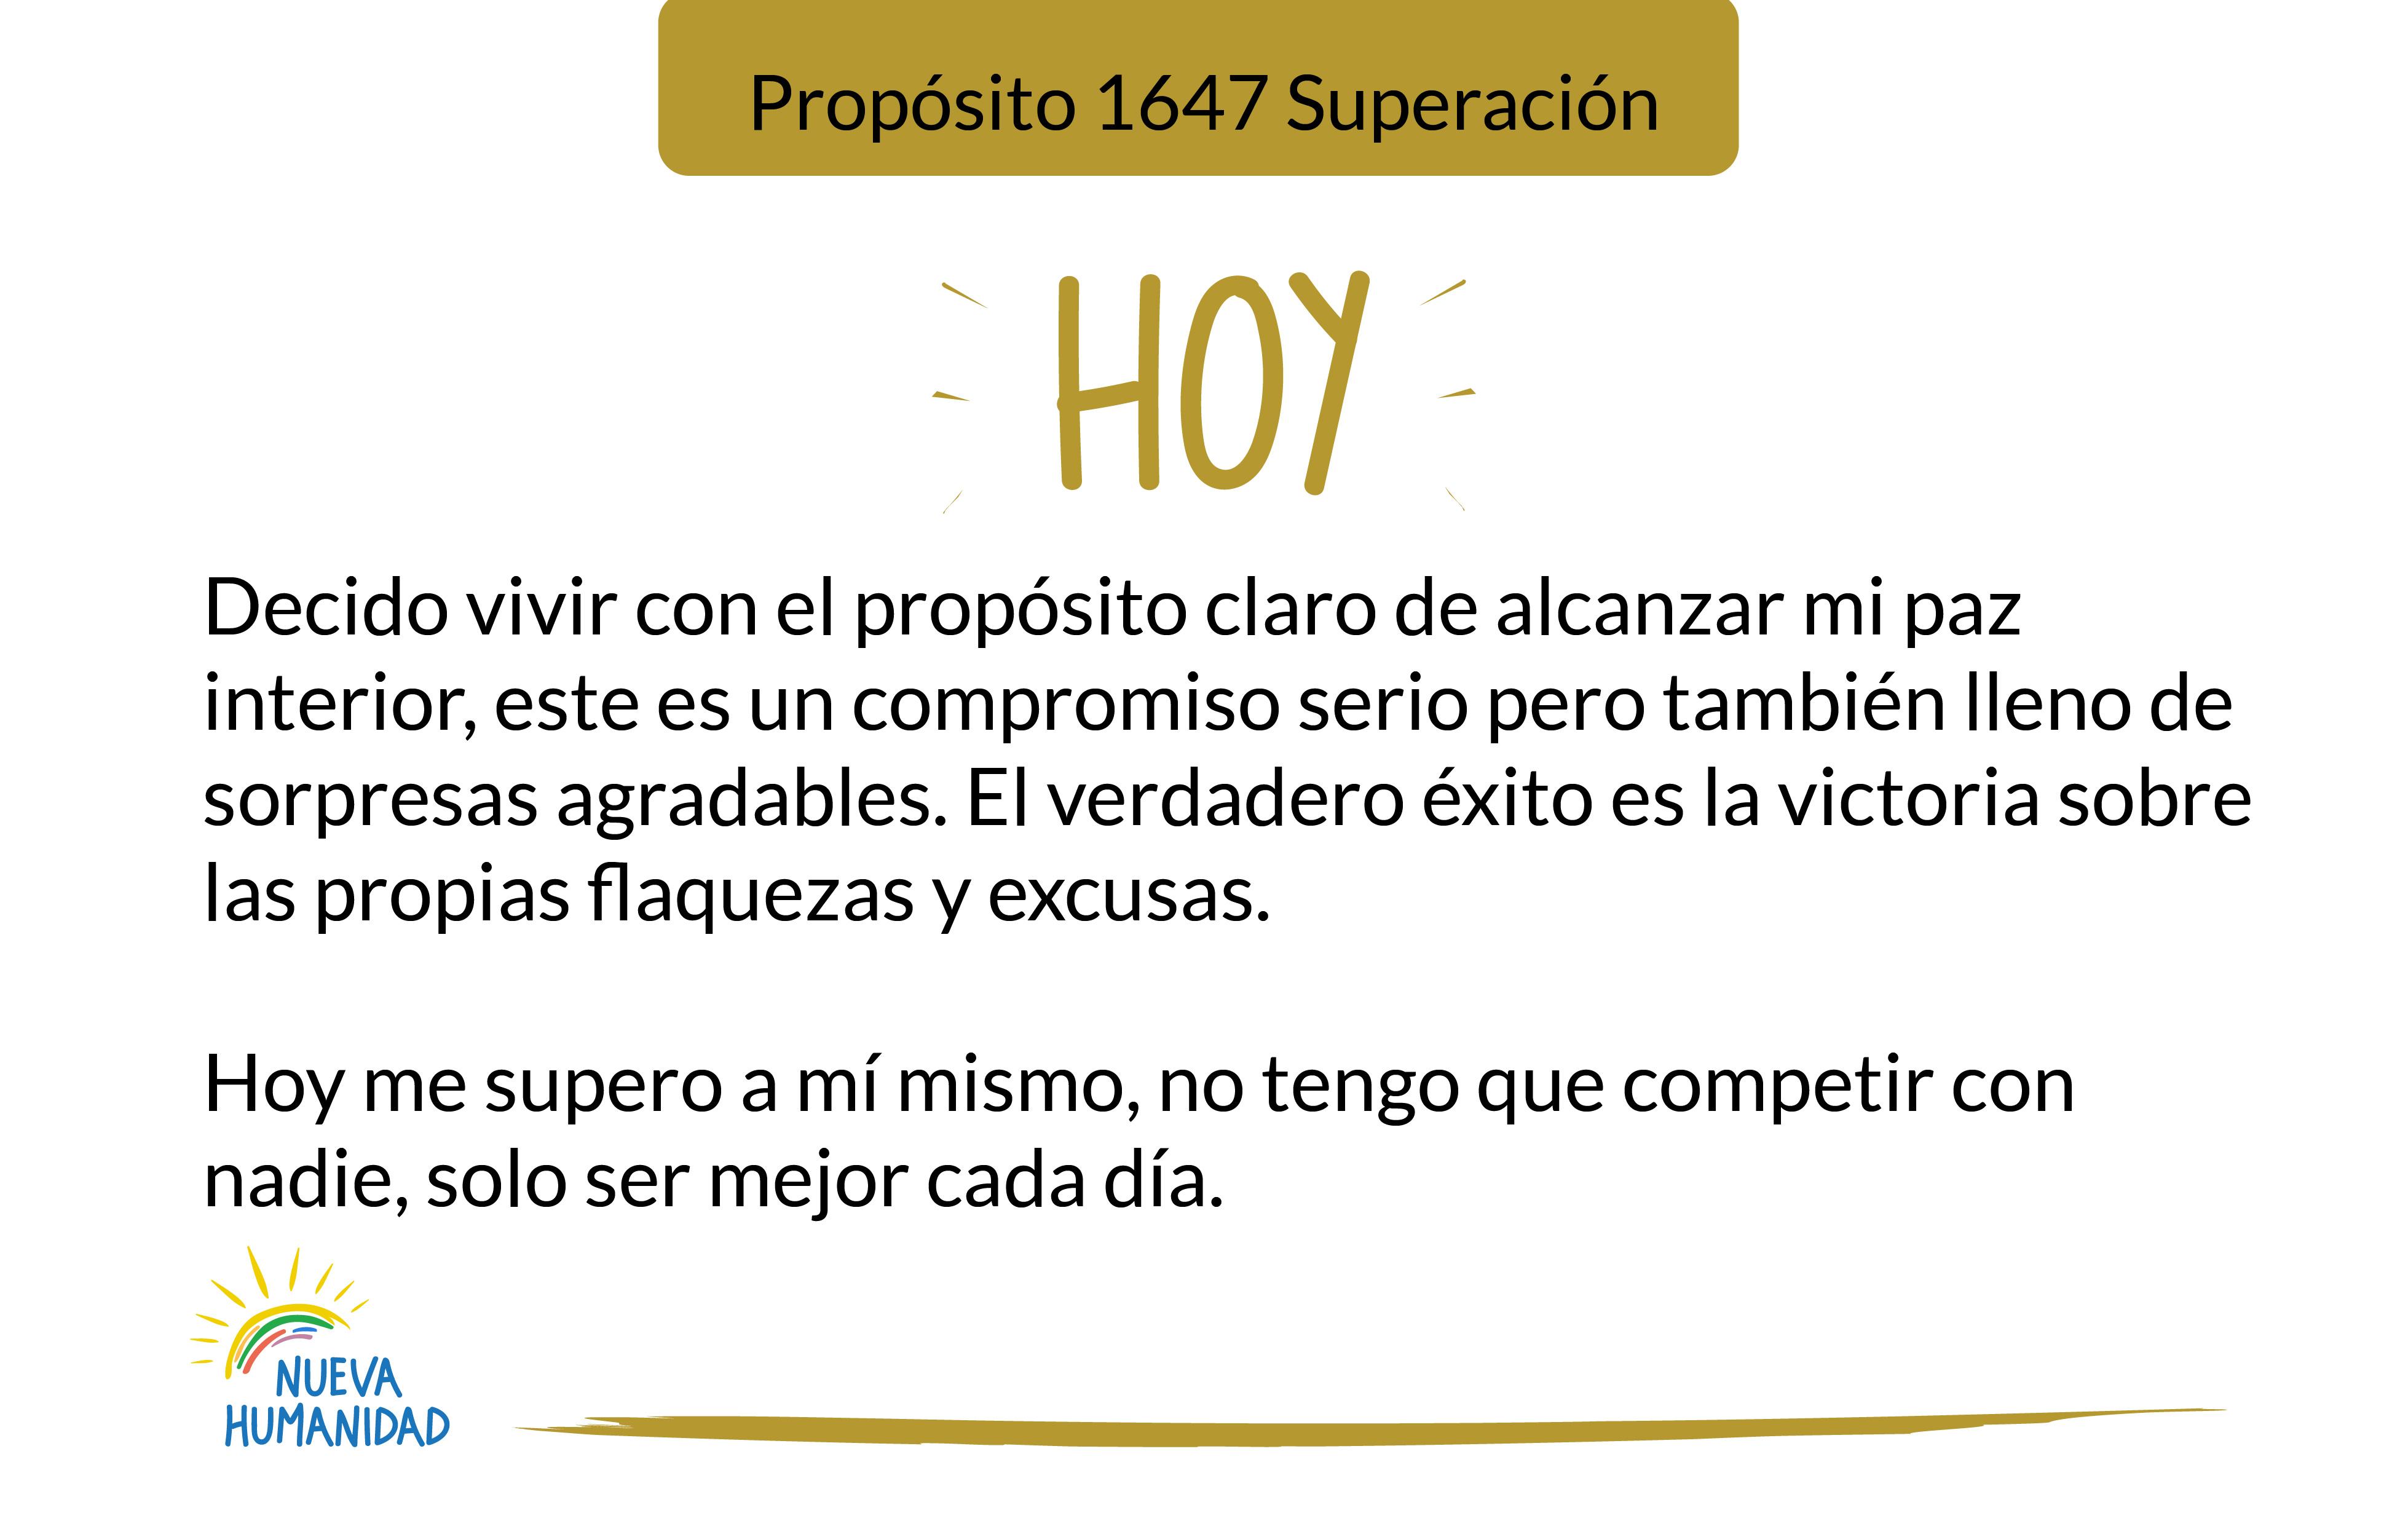 Propósito 1647 Superación